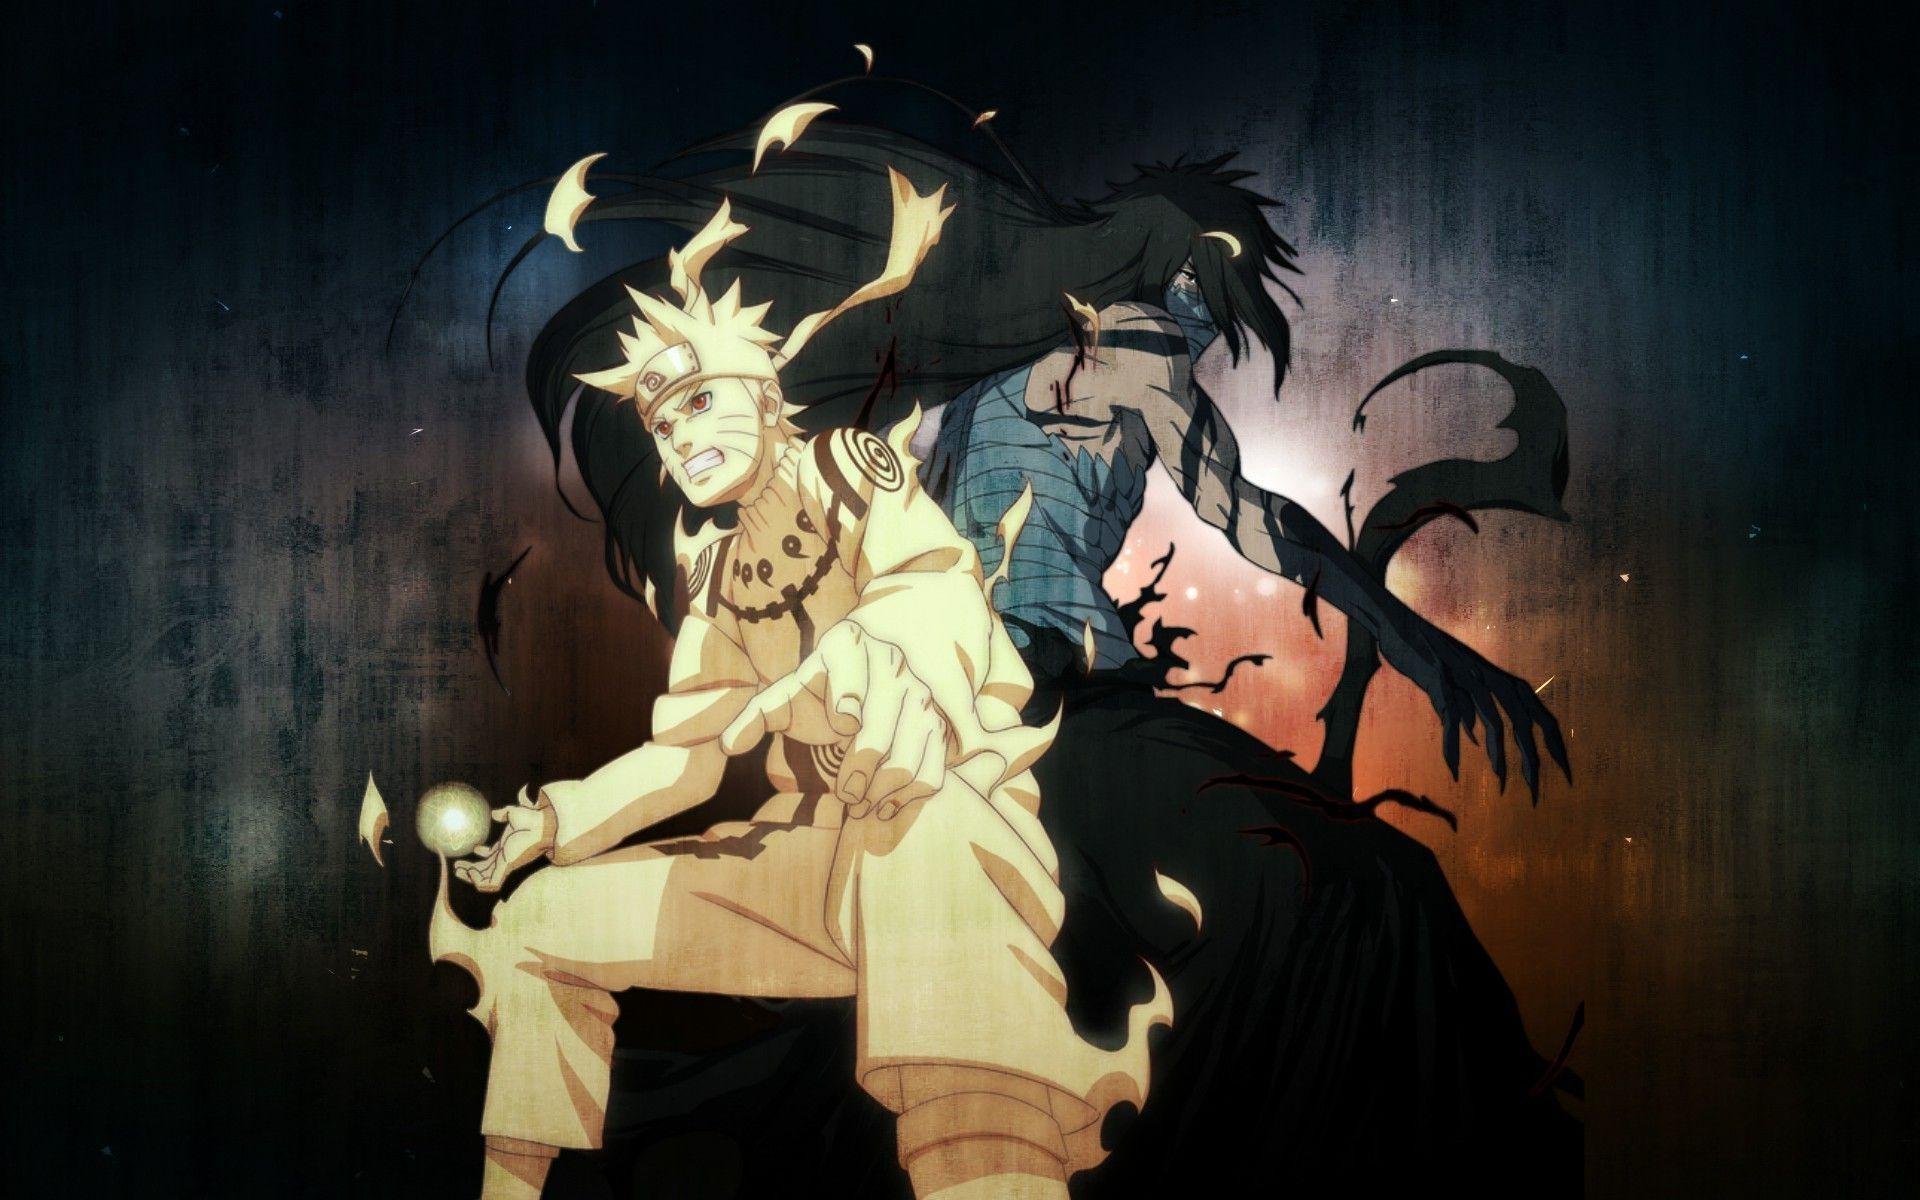 Ultimate Power of Rikudo Naruto Wallpaper, Anime Wallpaper, hd .